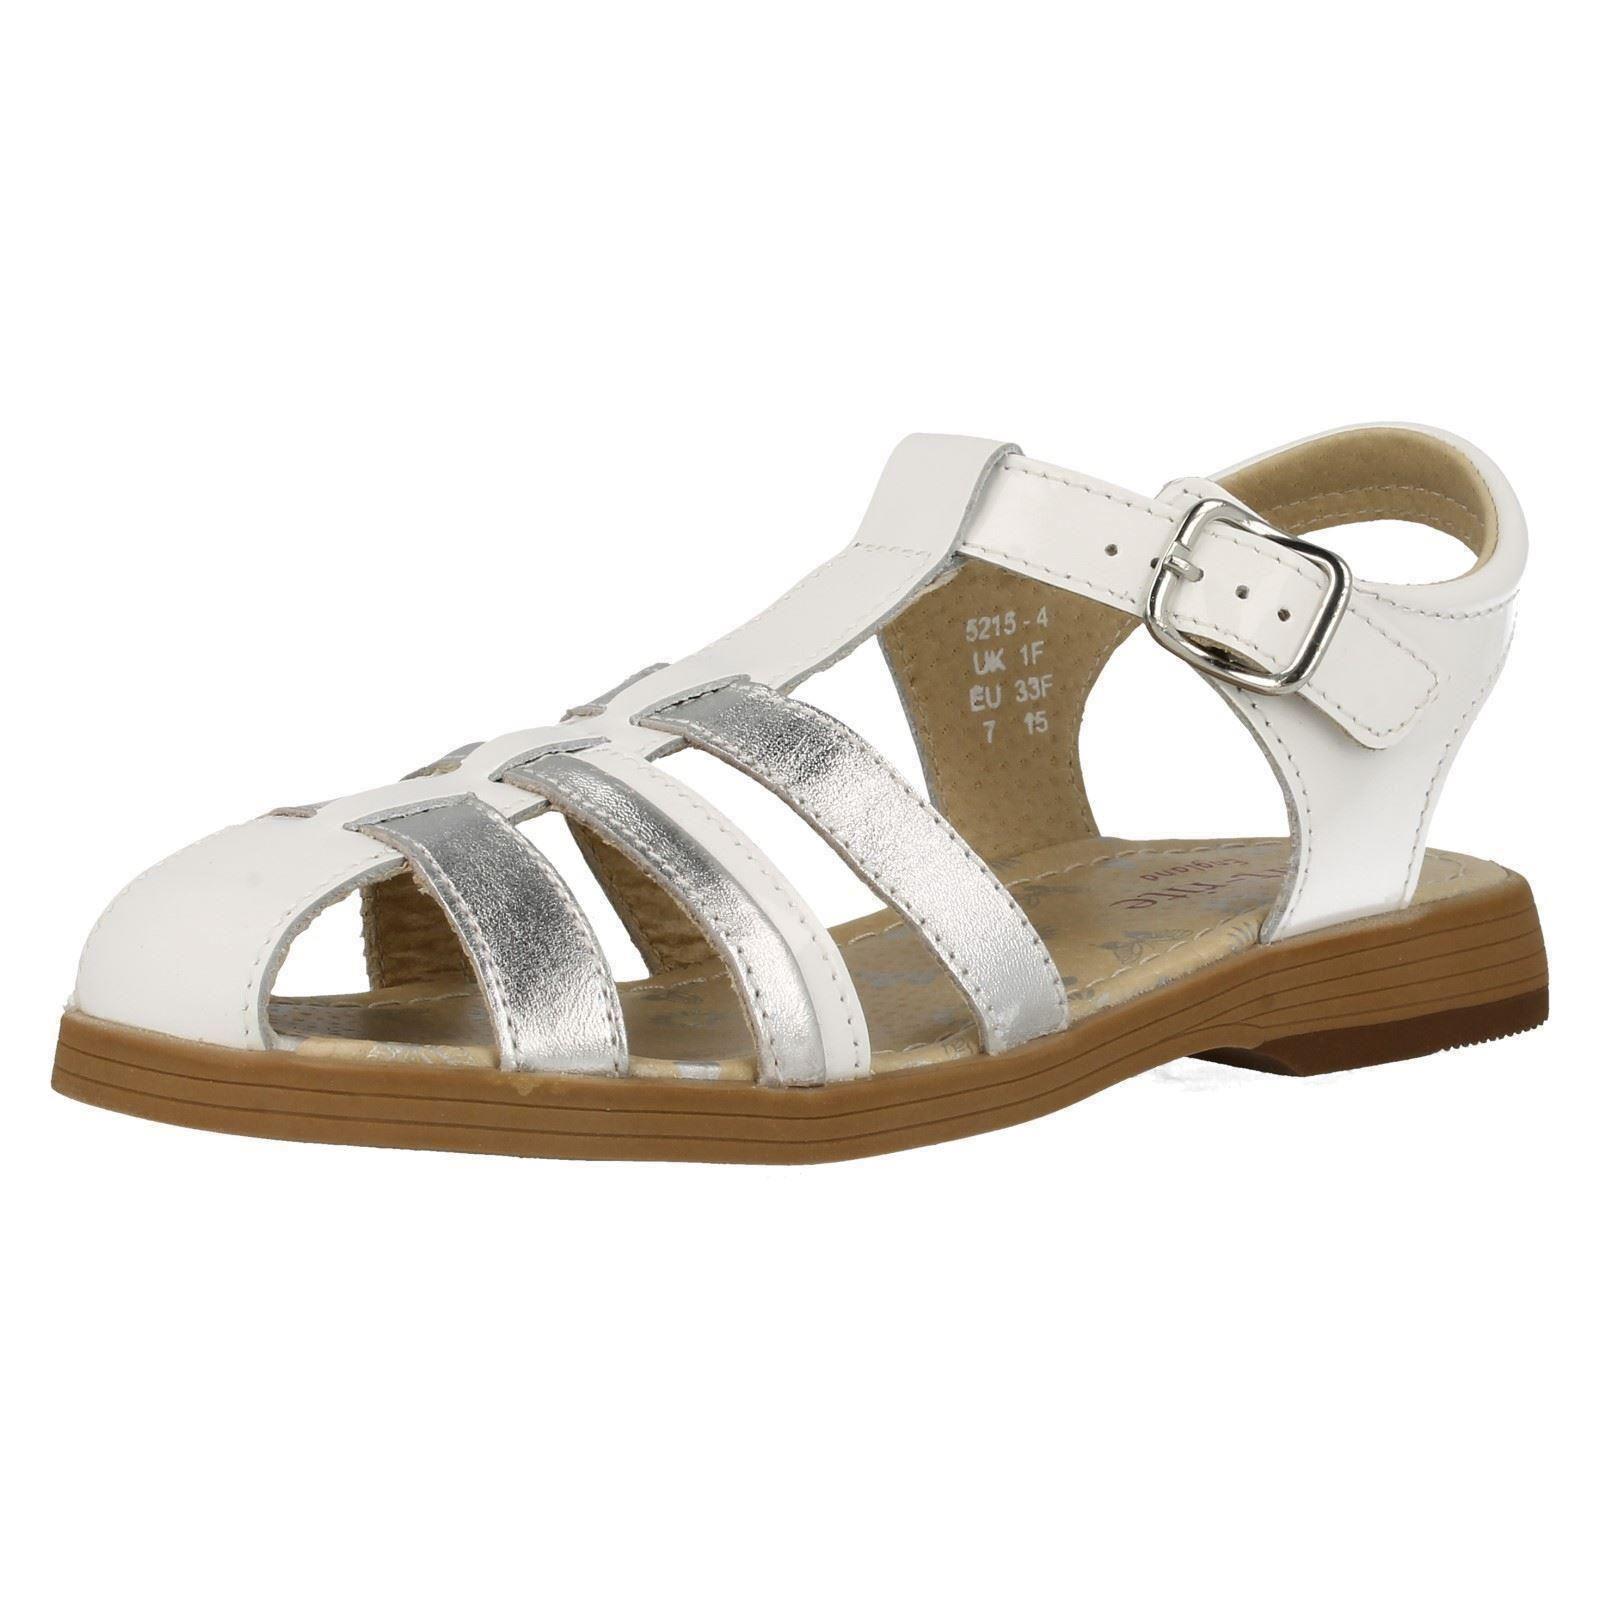 Girls Closed Toe Sandals